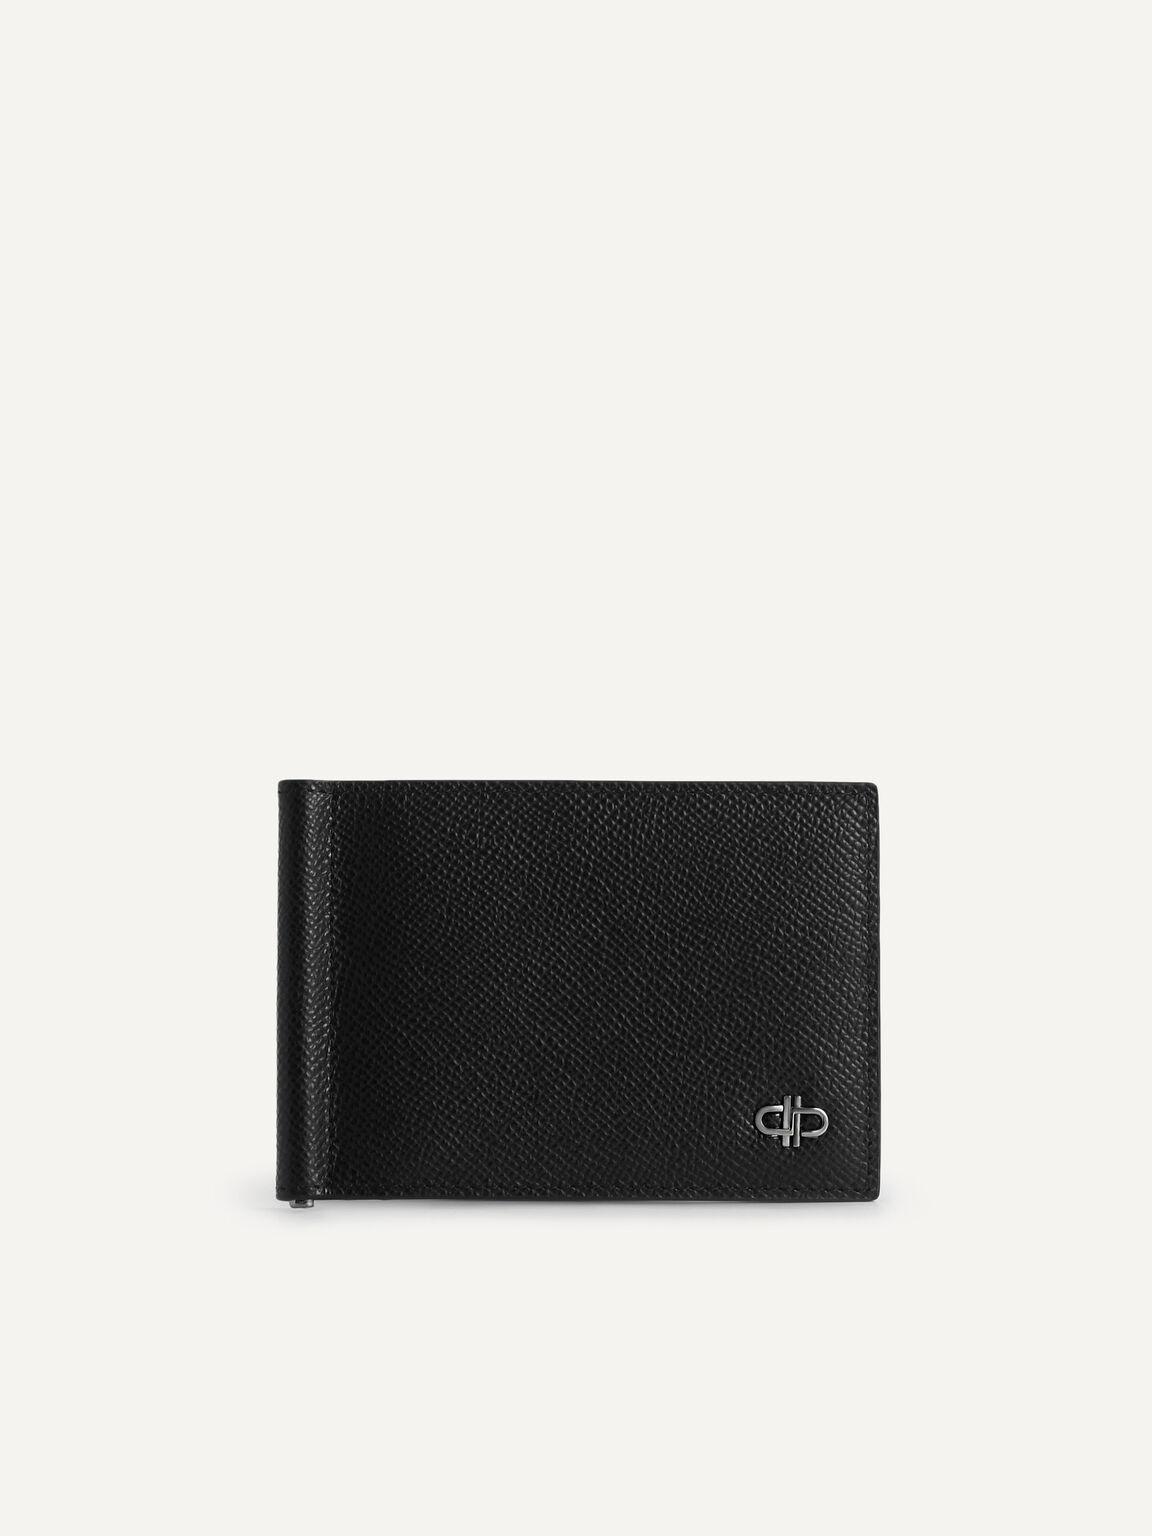 Icon織紋雙折疊帶錢夾皮革錢包, 黑色, hi-res